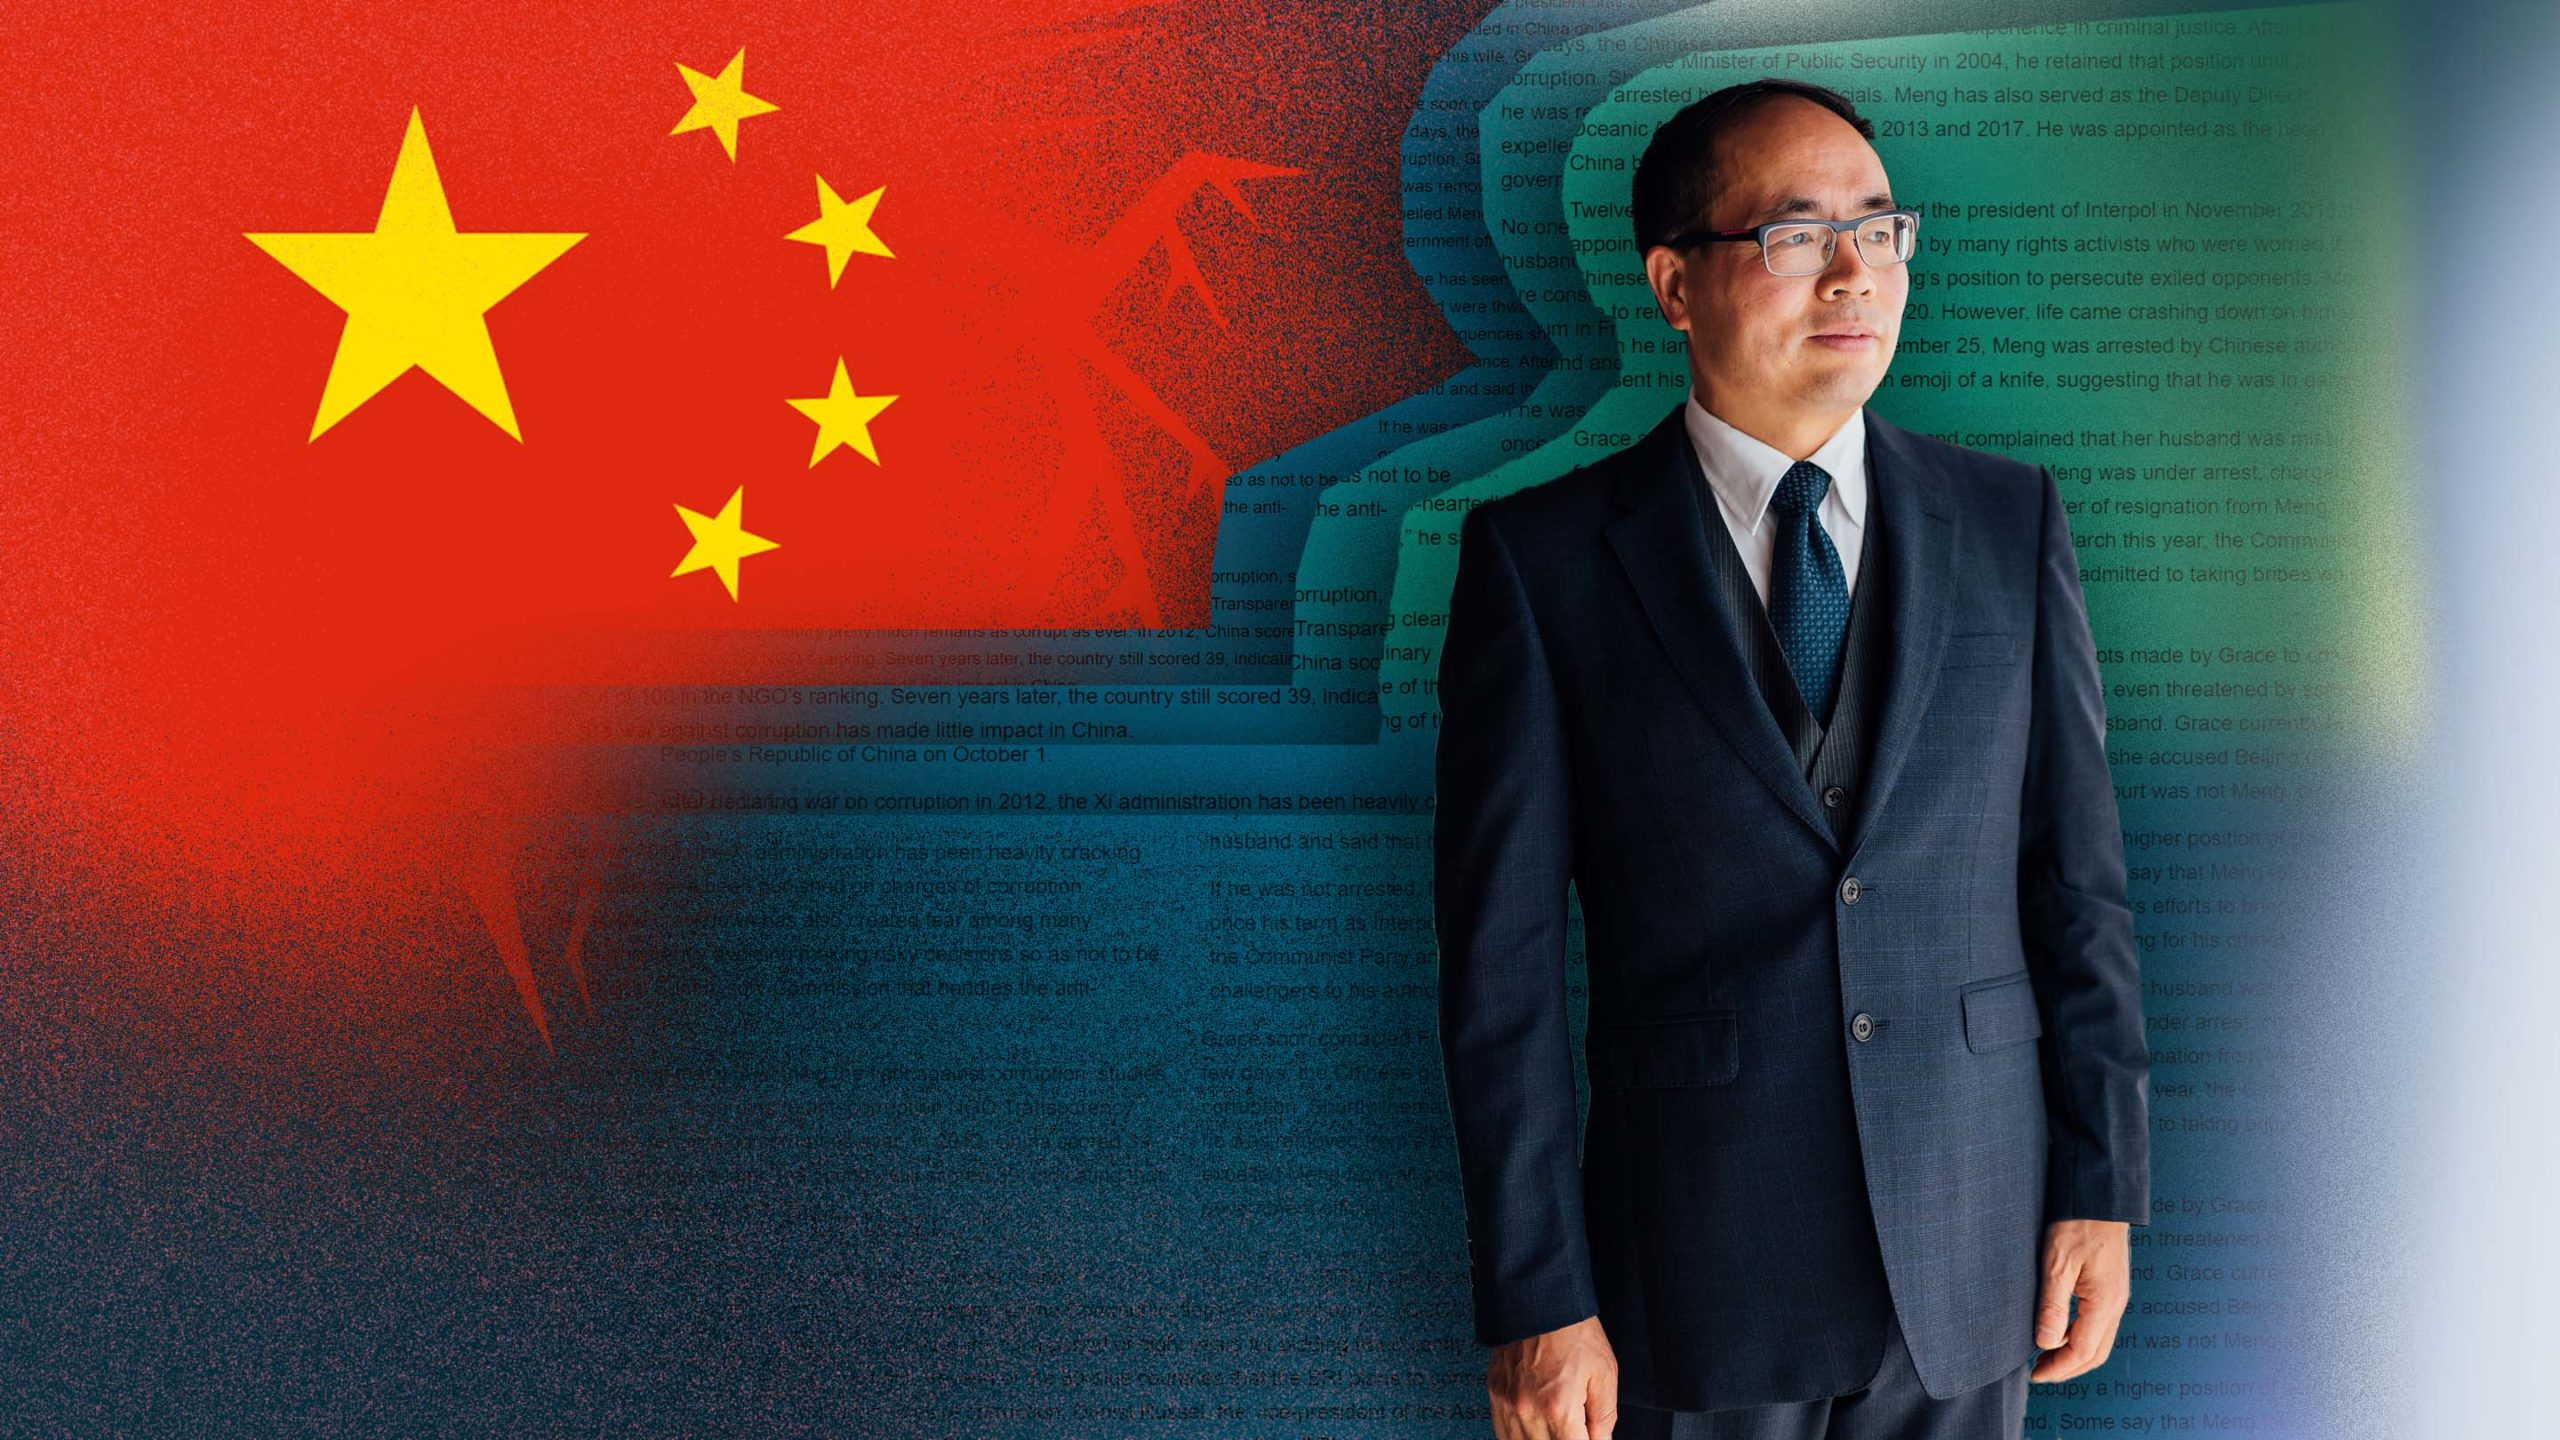 censorship of Chinese-language media abroad